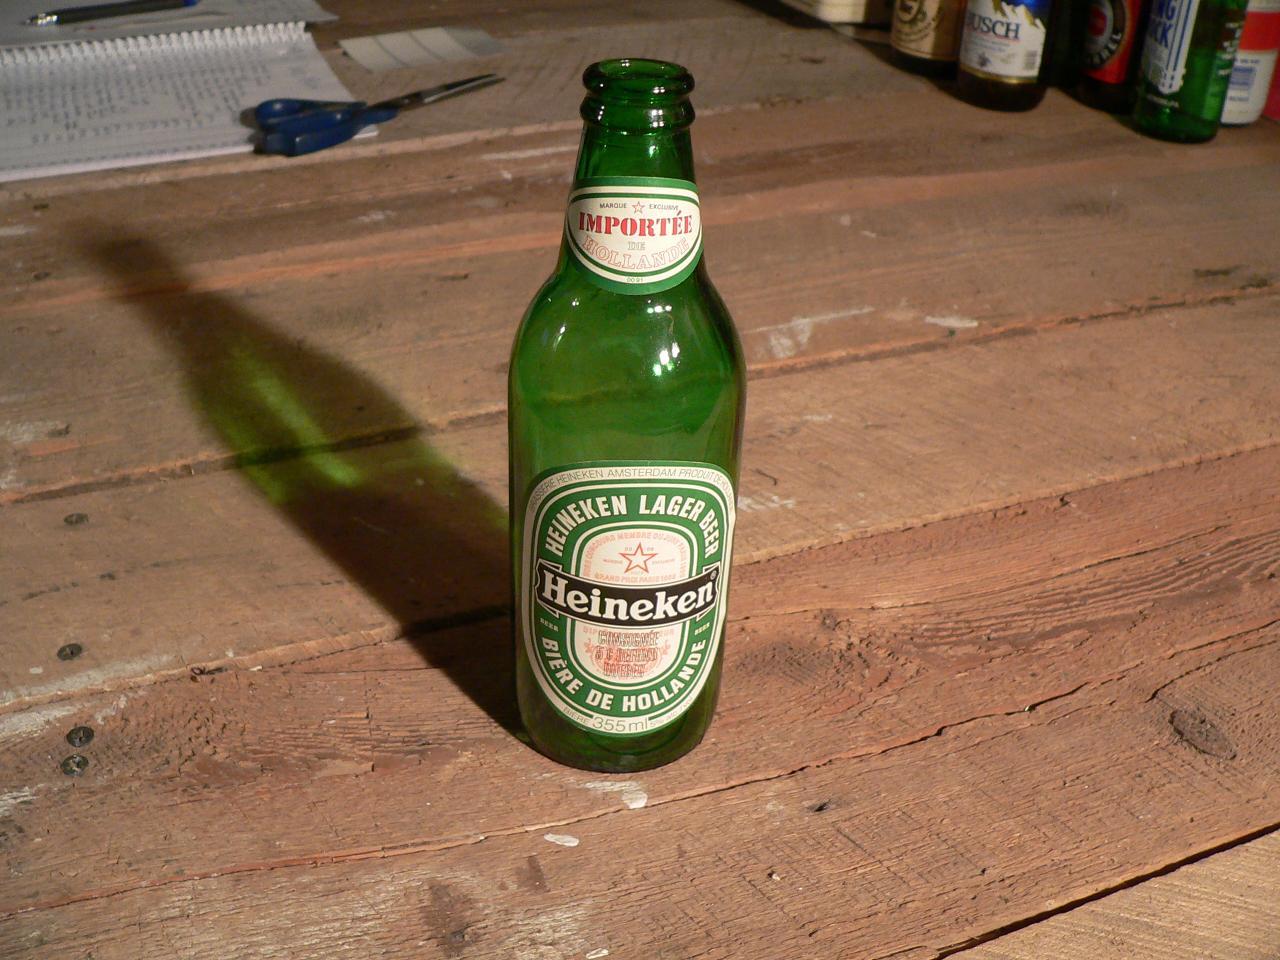 Biere heineken # 4739.35